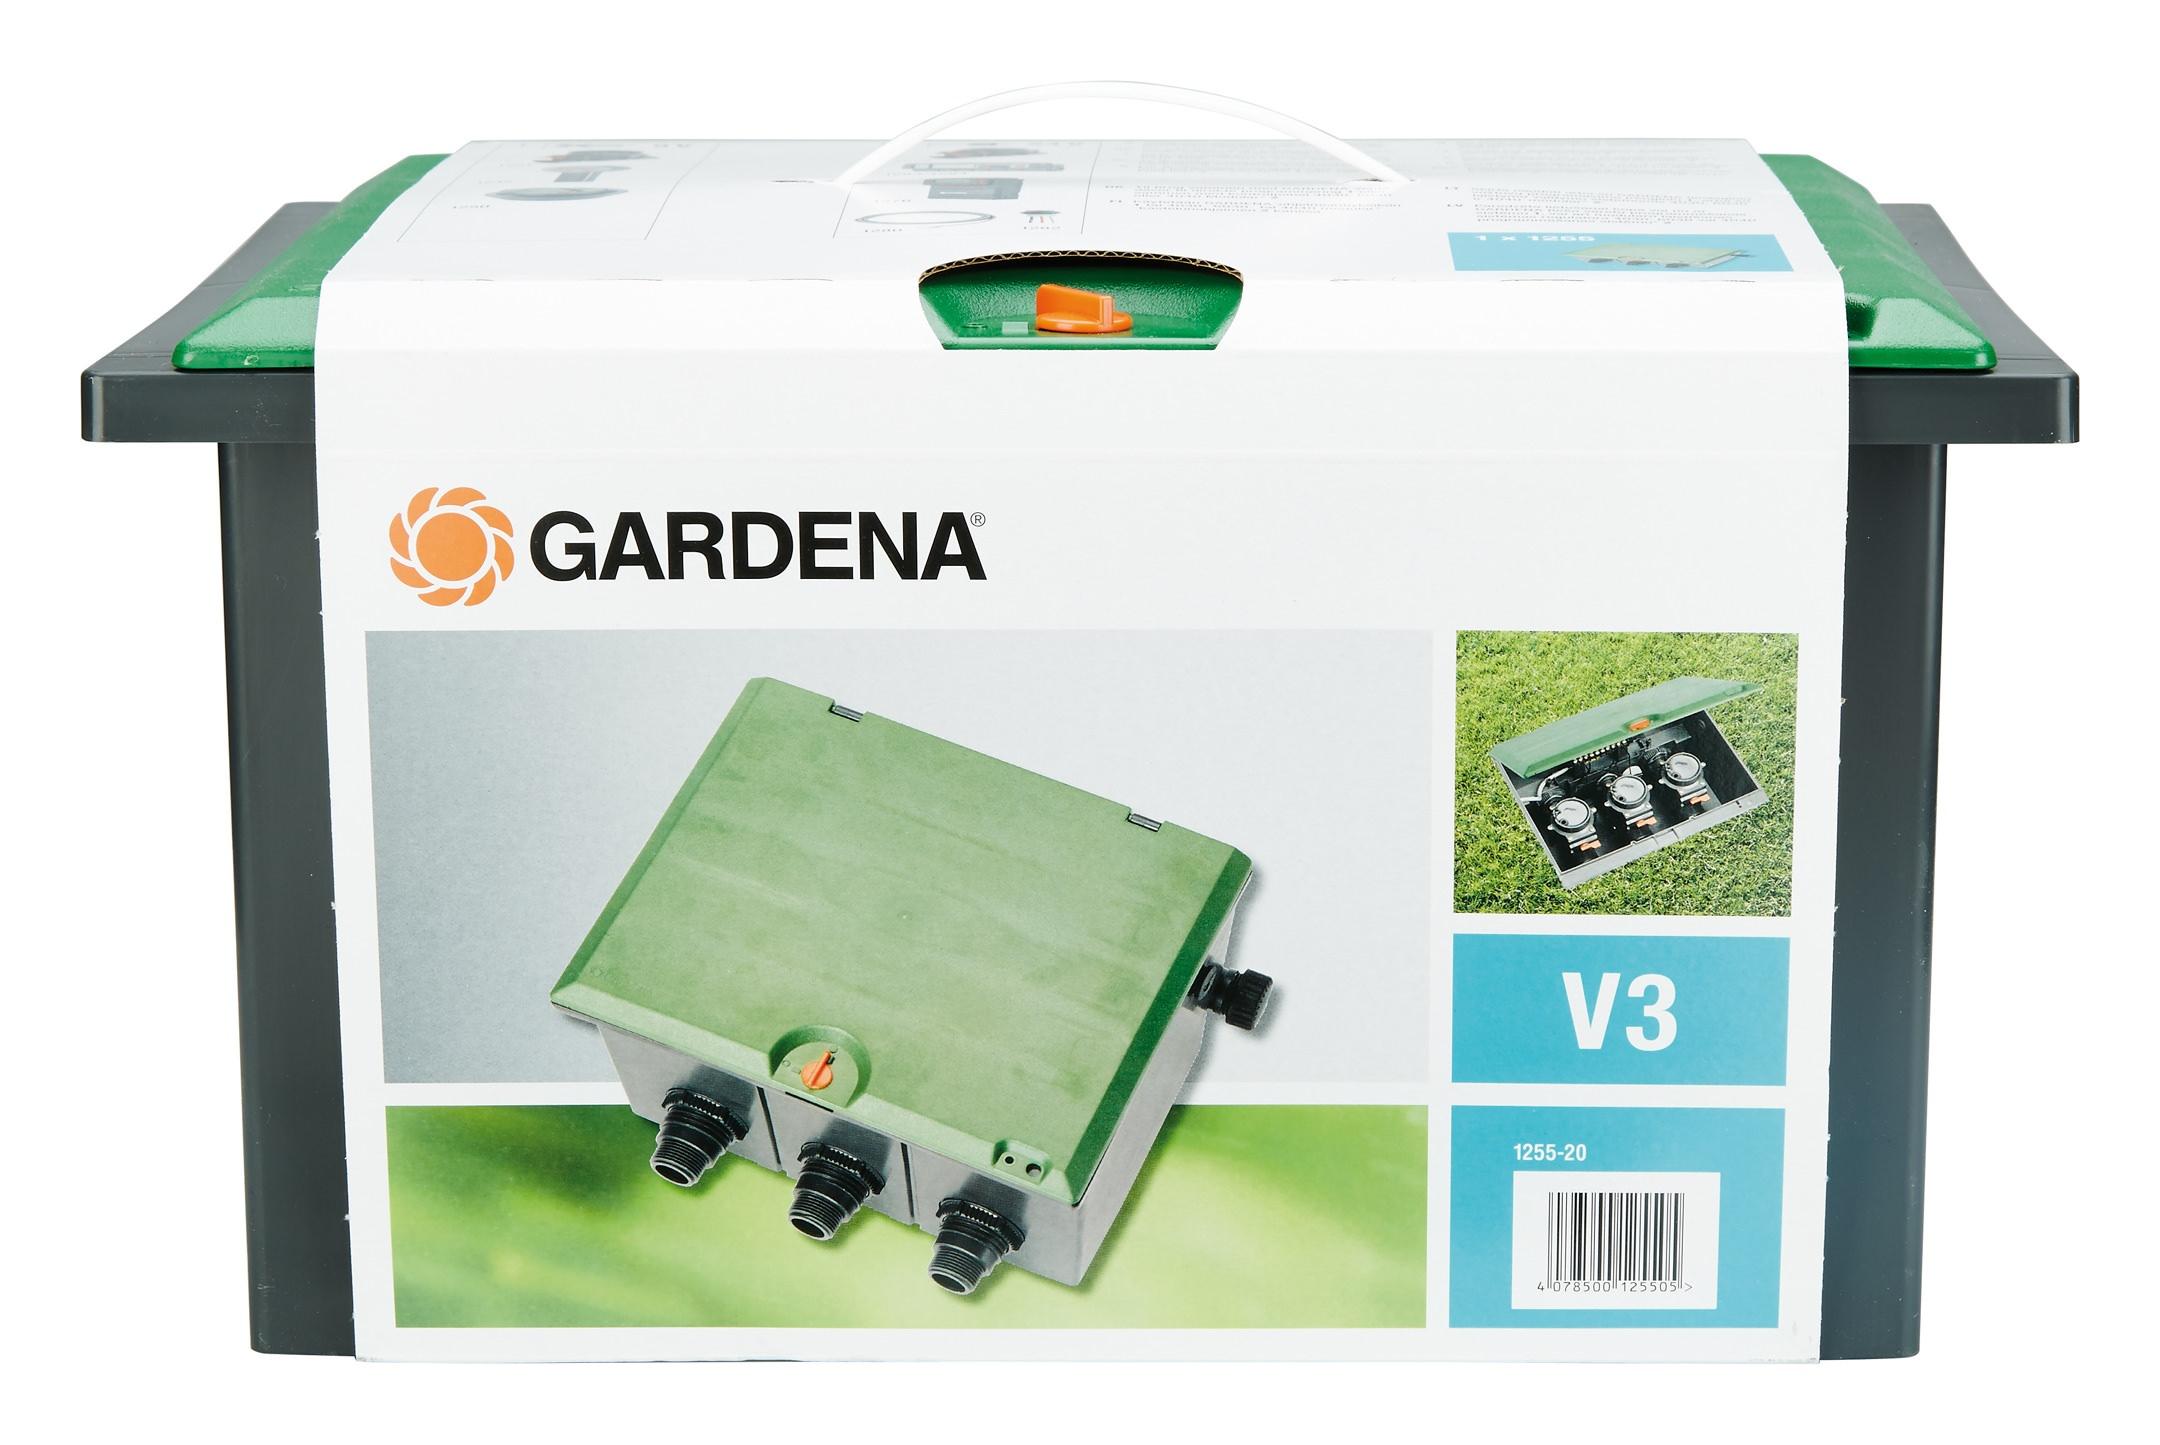 Gardena Ventilschacht V 3 (Ohne Ventil) - 01255-20